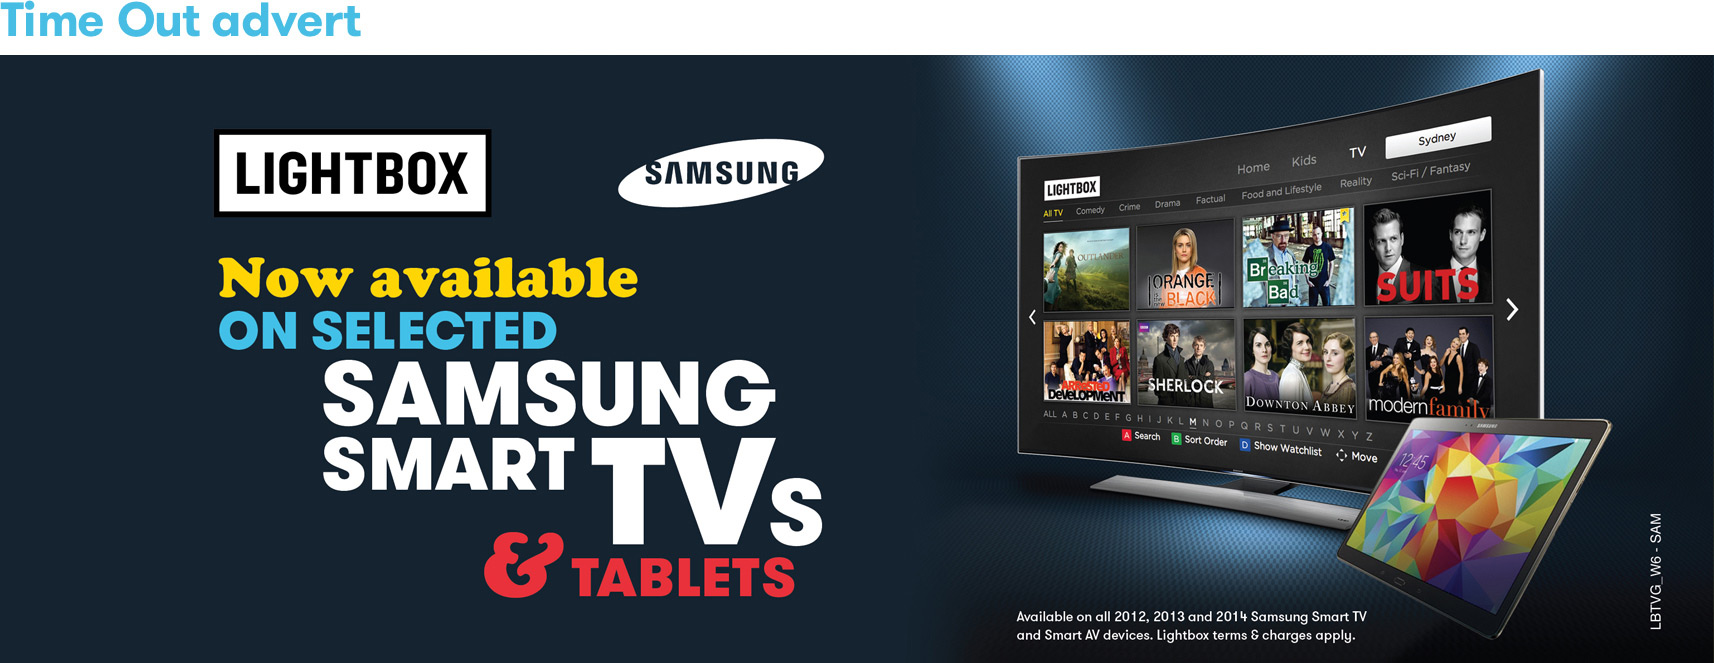 Lightbox Samsung